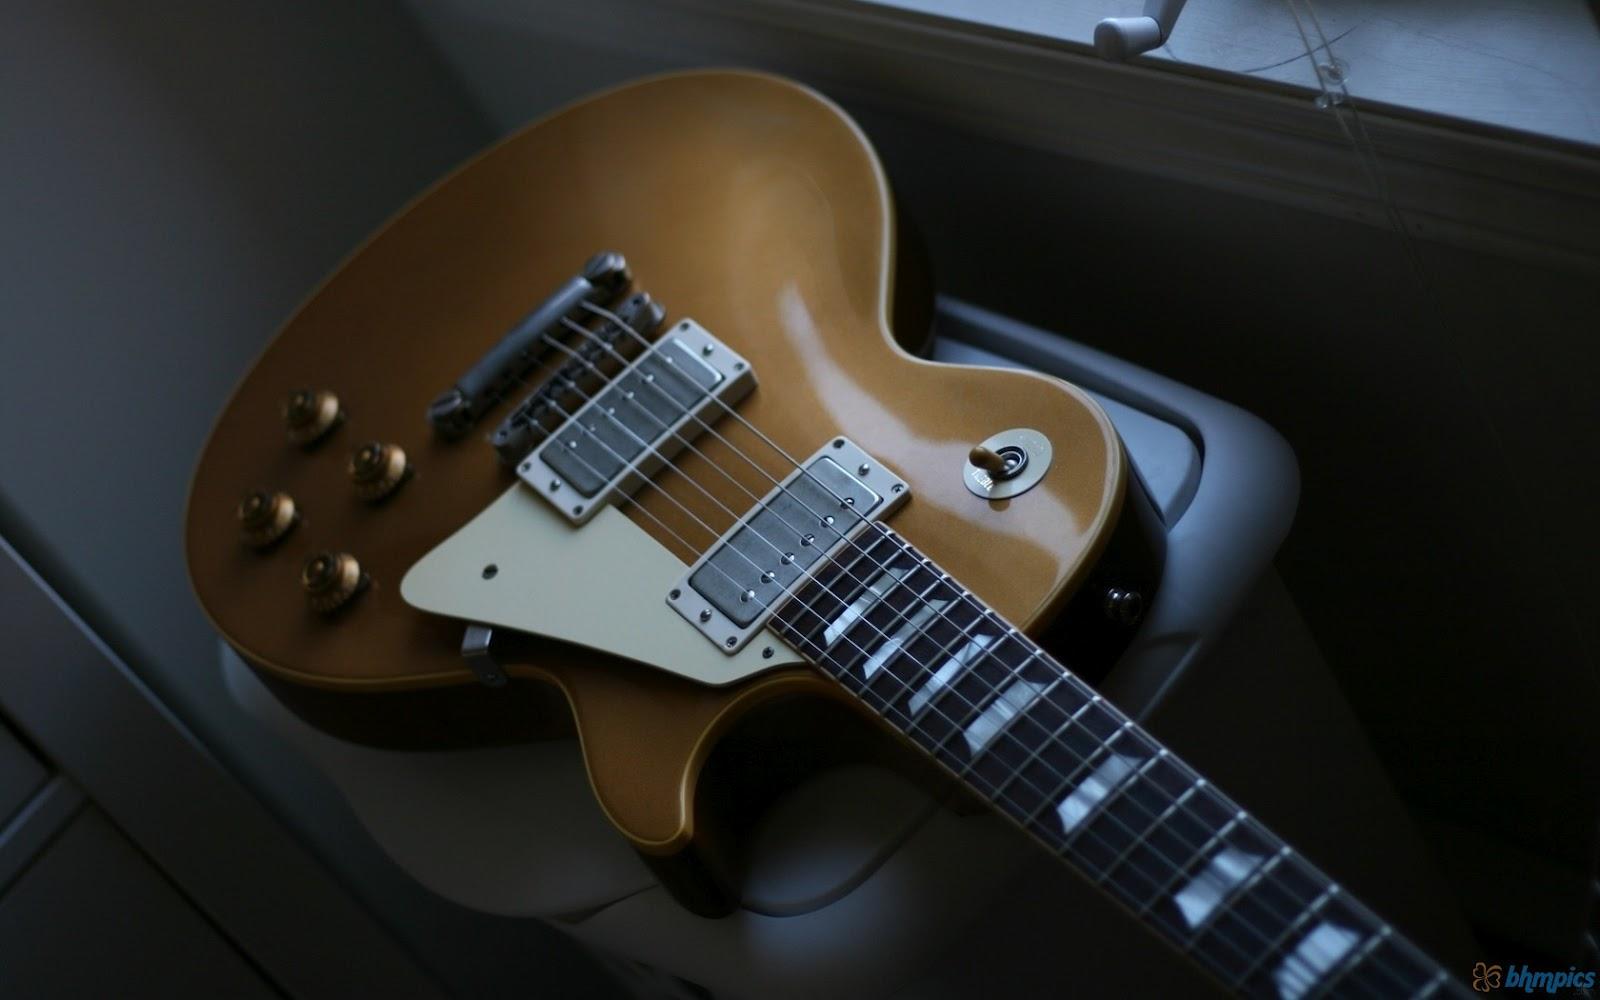 gibson guitar wallpaper - photo #14